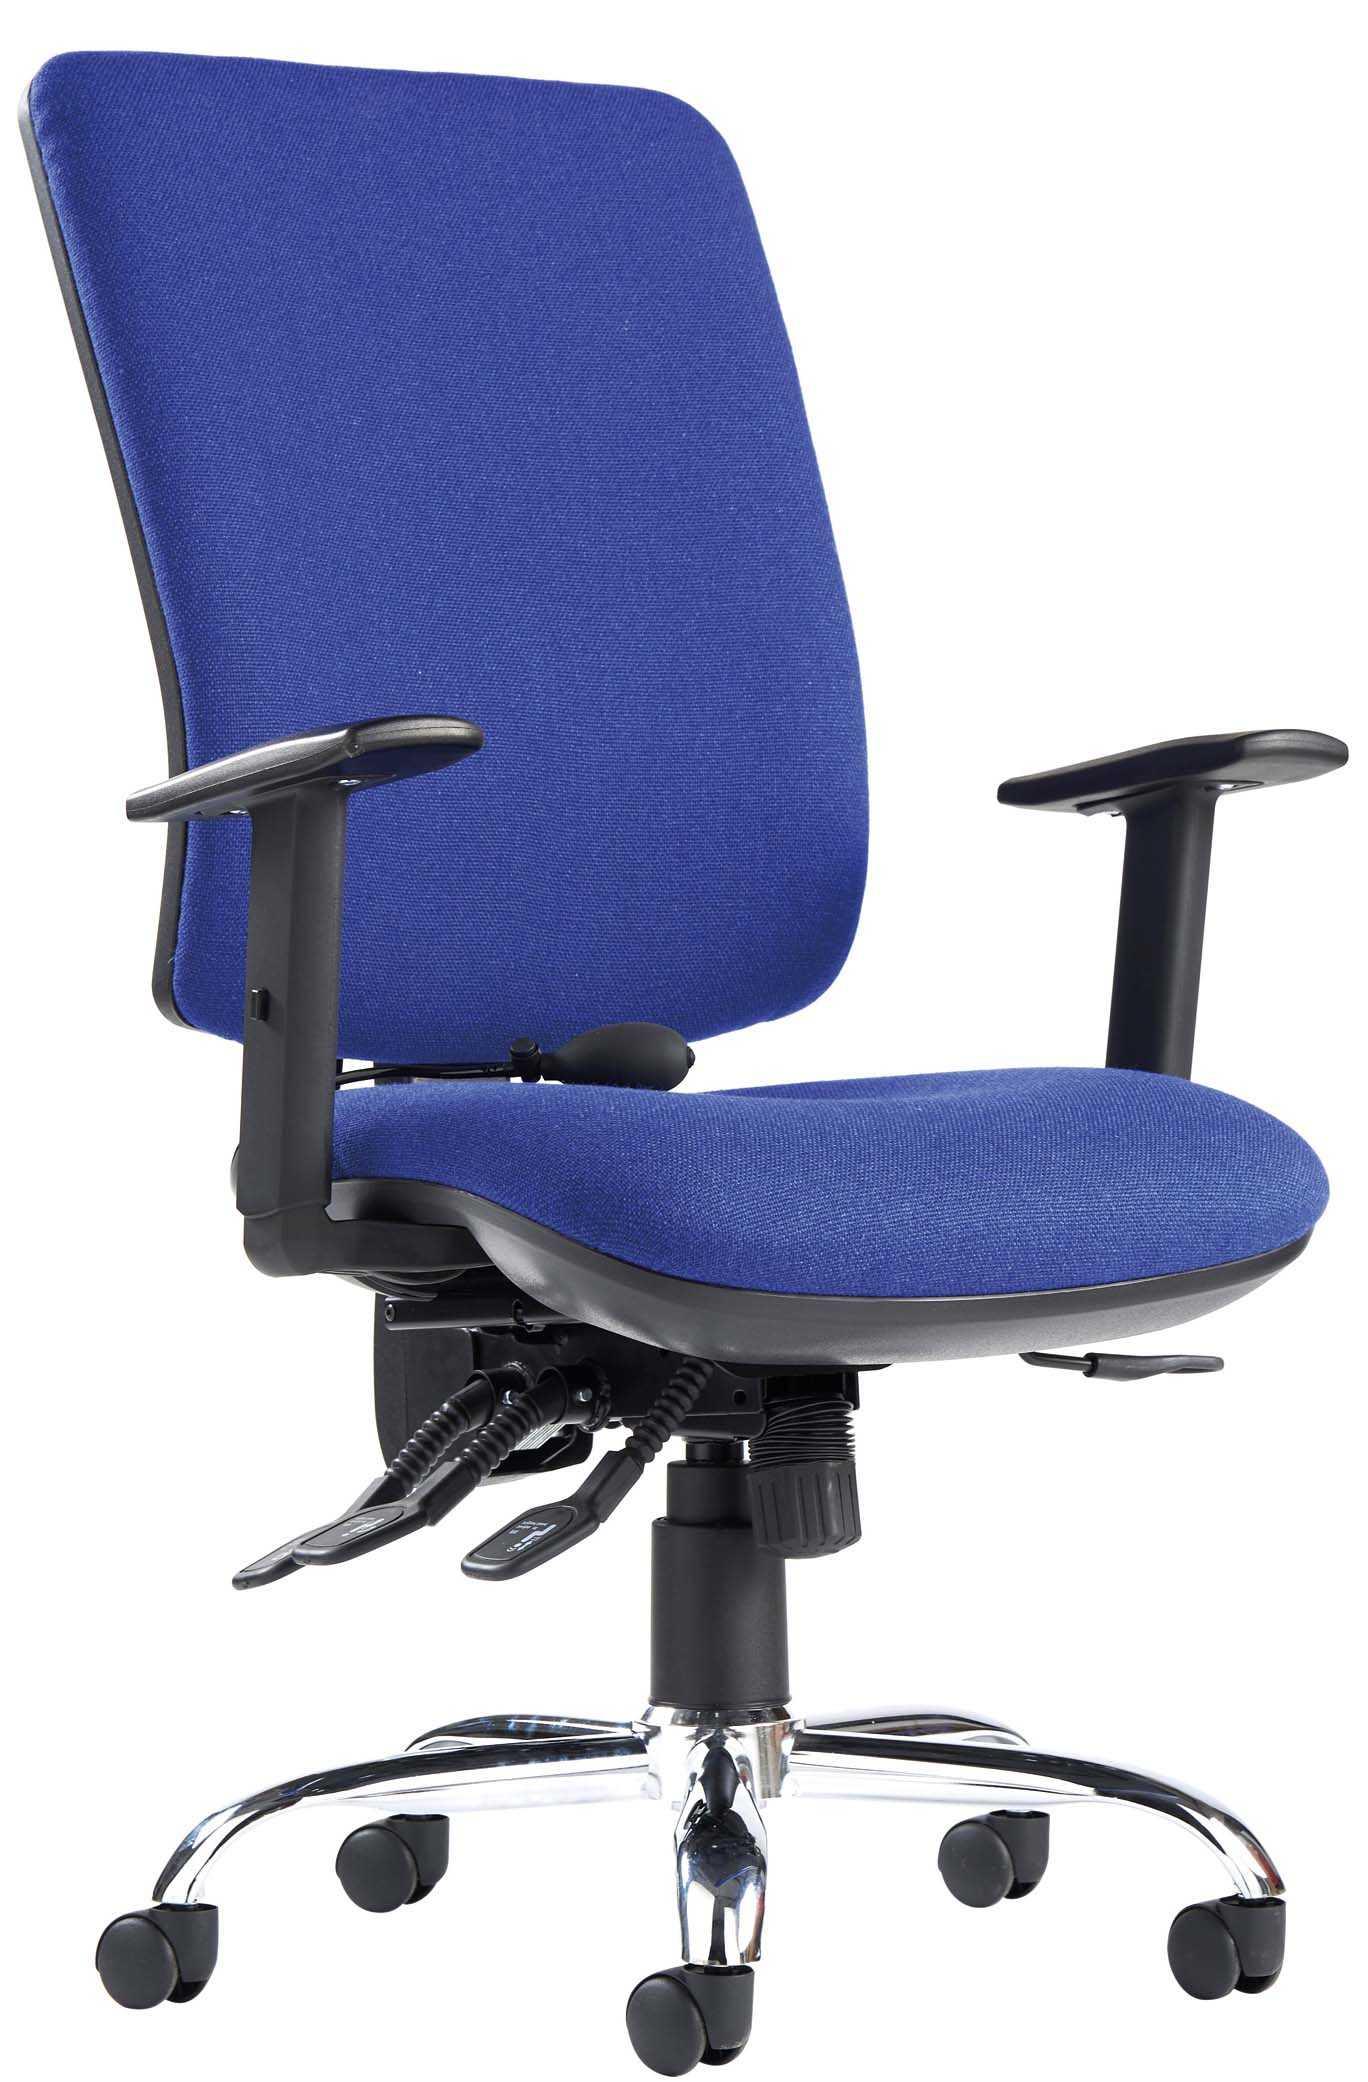 Senza Ergonomic Task chair a 24 Hour Use fice Chair